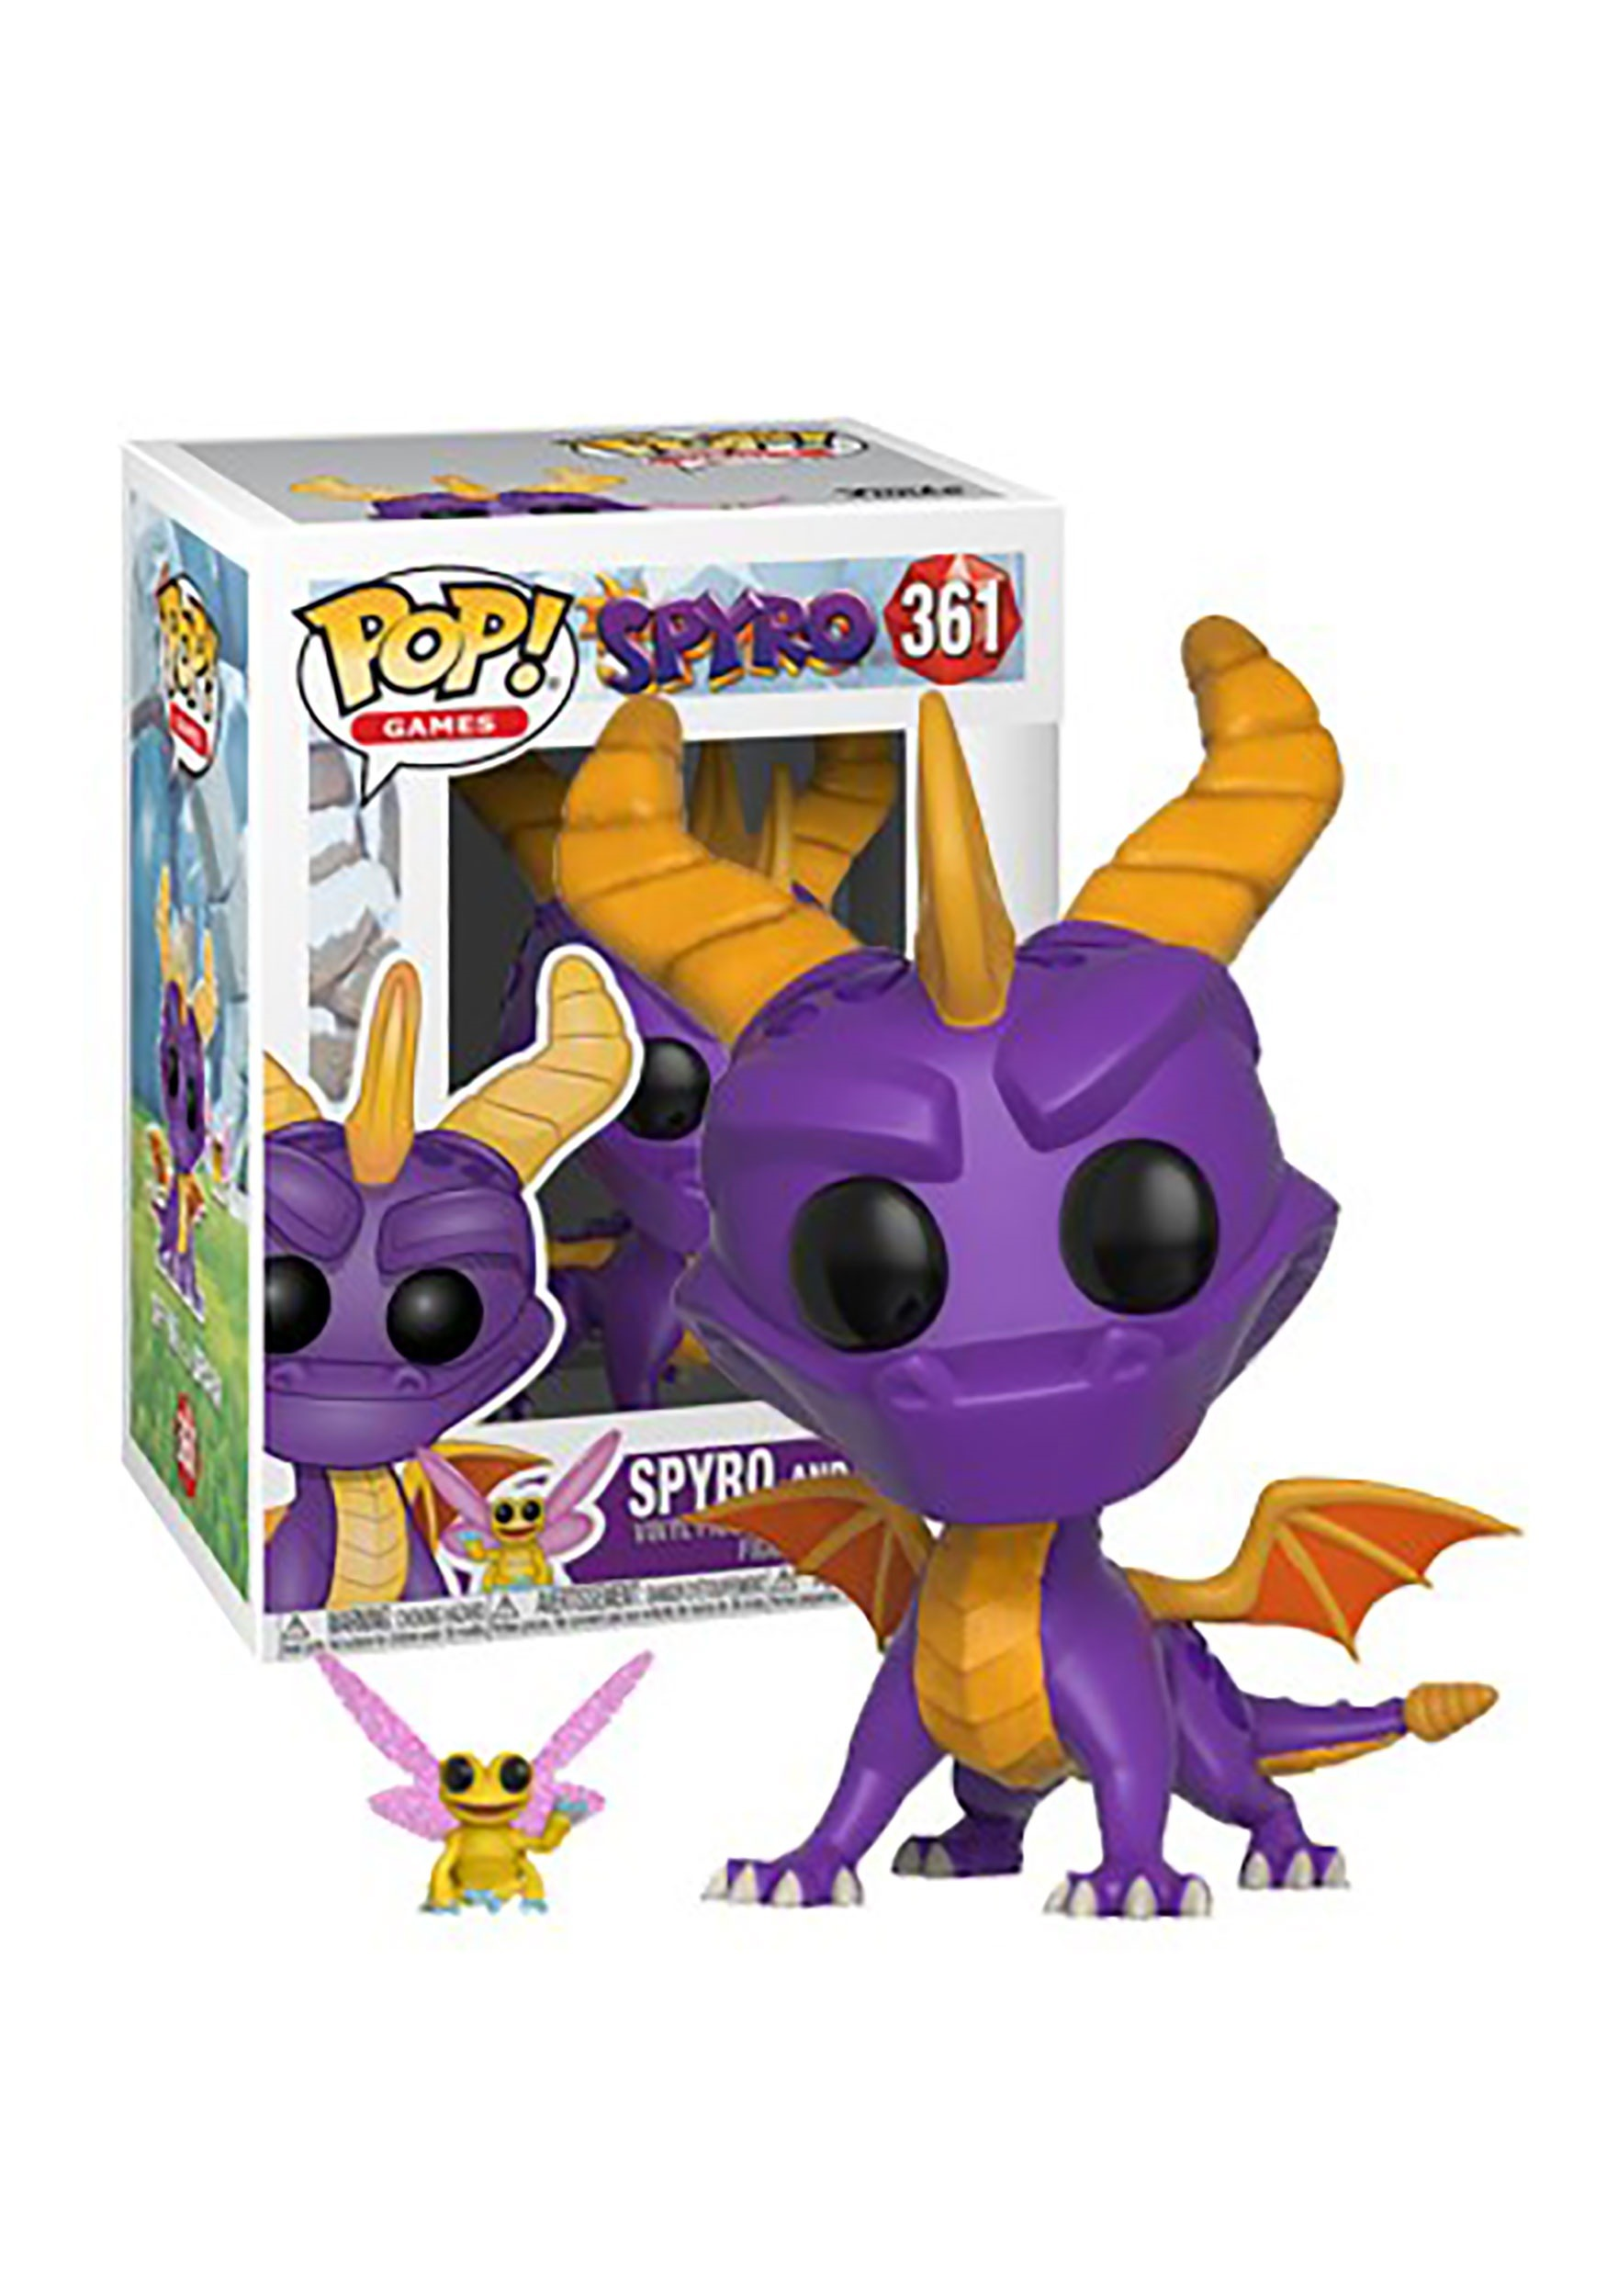 Spyro The Dragon Amp Sparx Pop